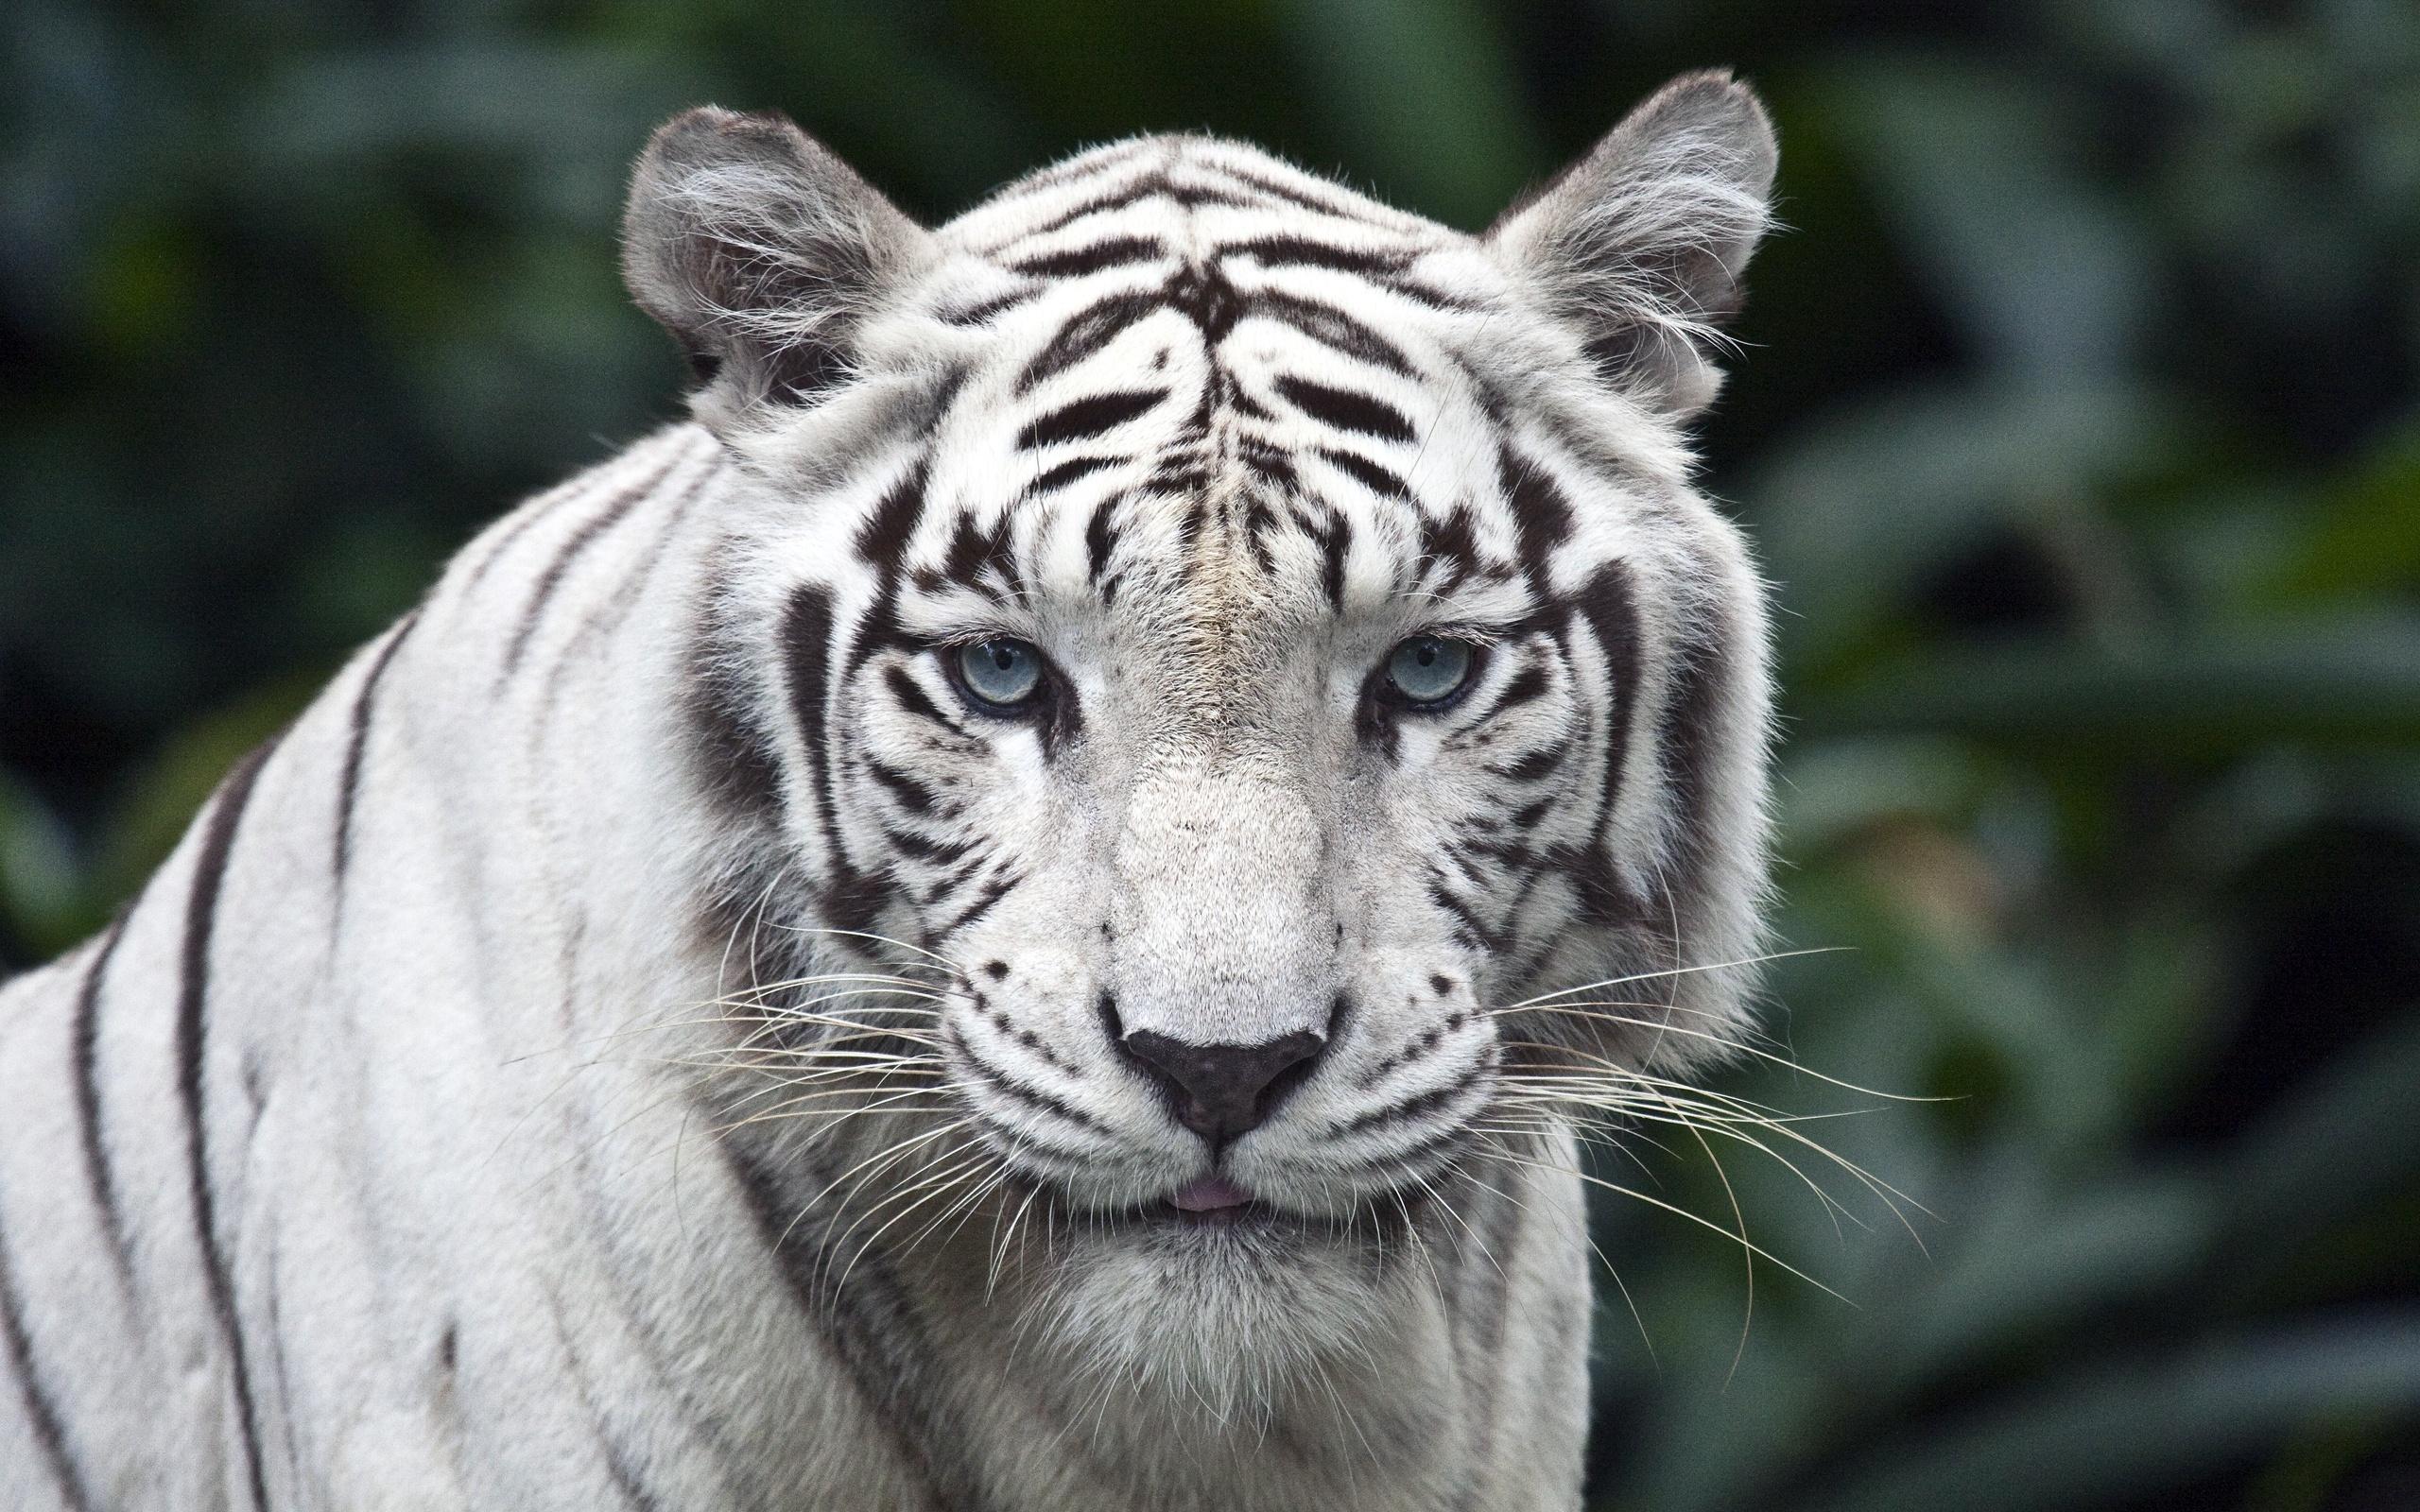 Tigre Blanc Haute Resolution Fond D Ecran Tigre Blanco 2560x1600 Wallpapertip